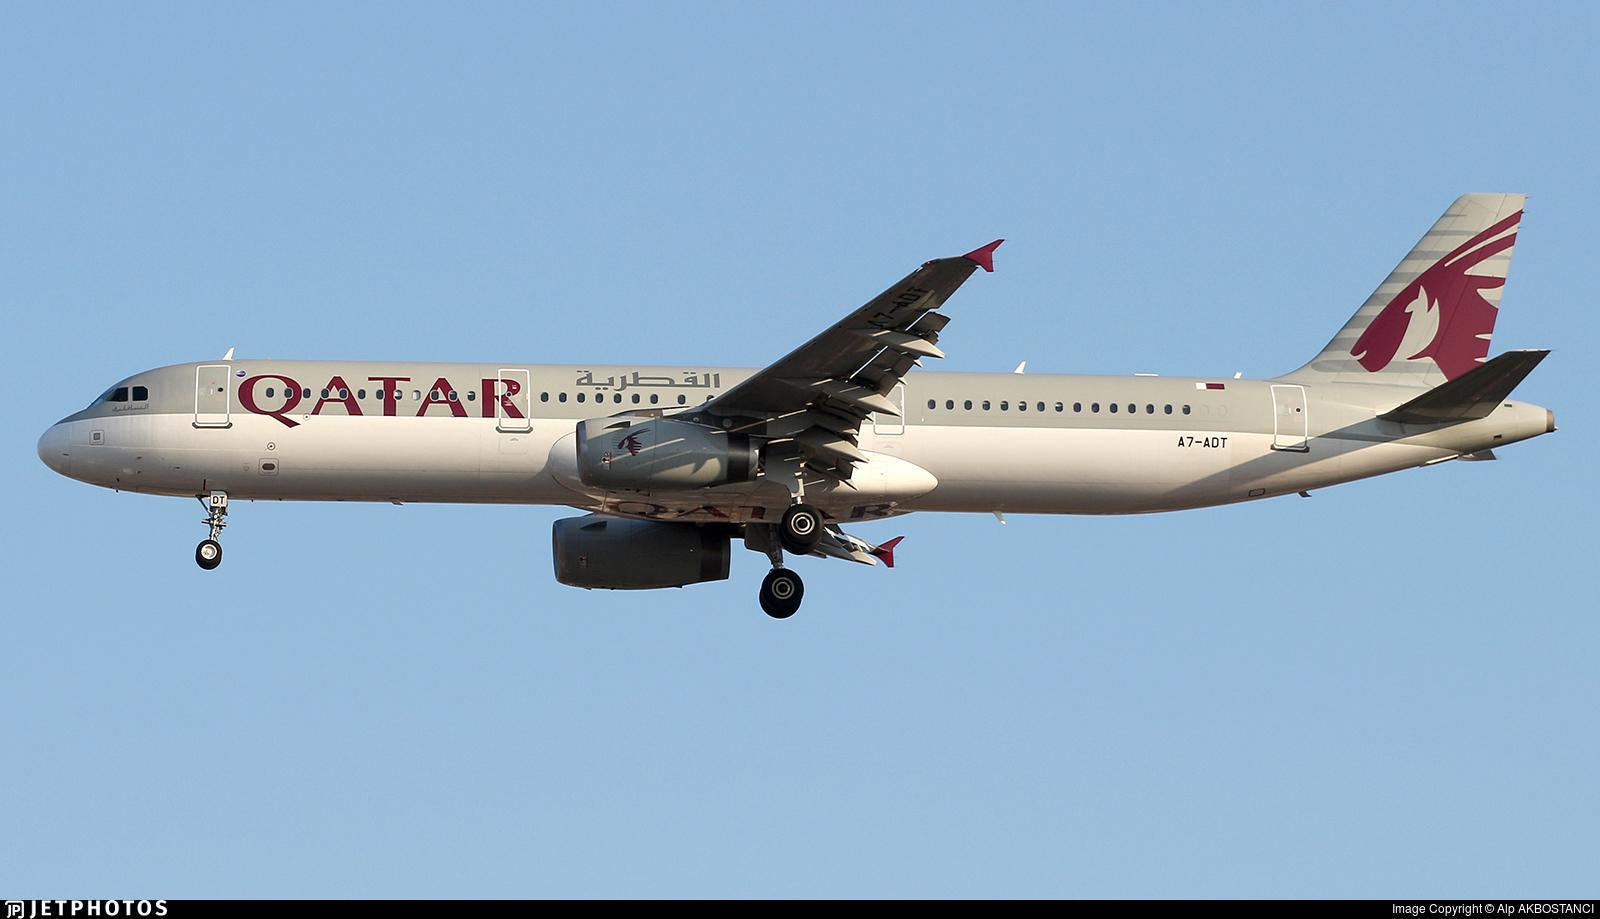 A7-ADT | Airbus A321-231 | Qatar Airways | Alp AKBOSTANCI | JetPhotos